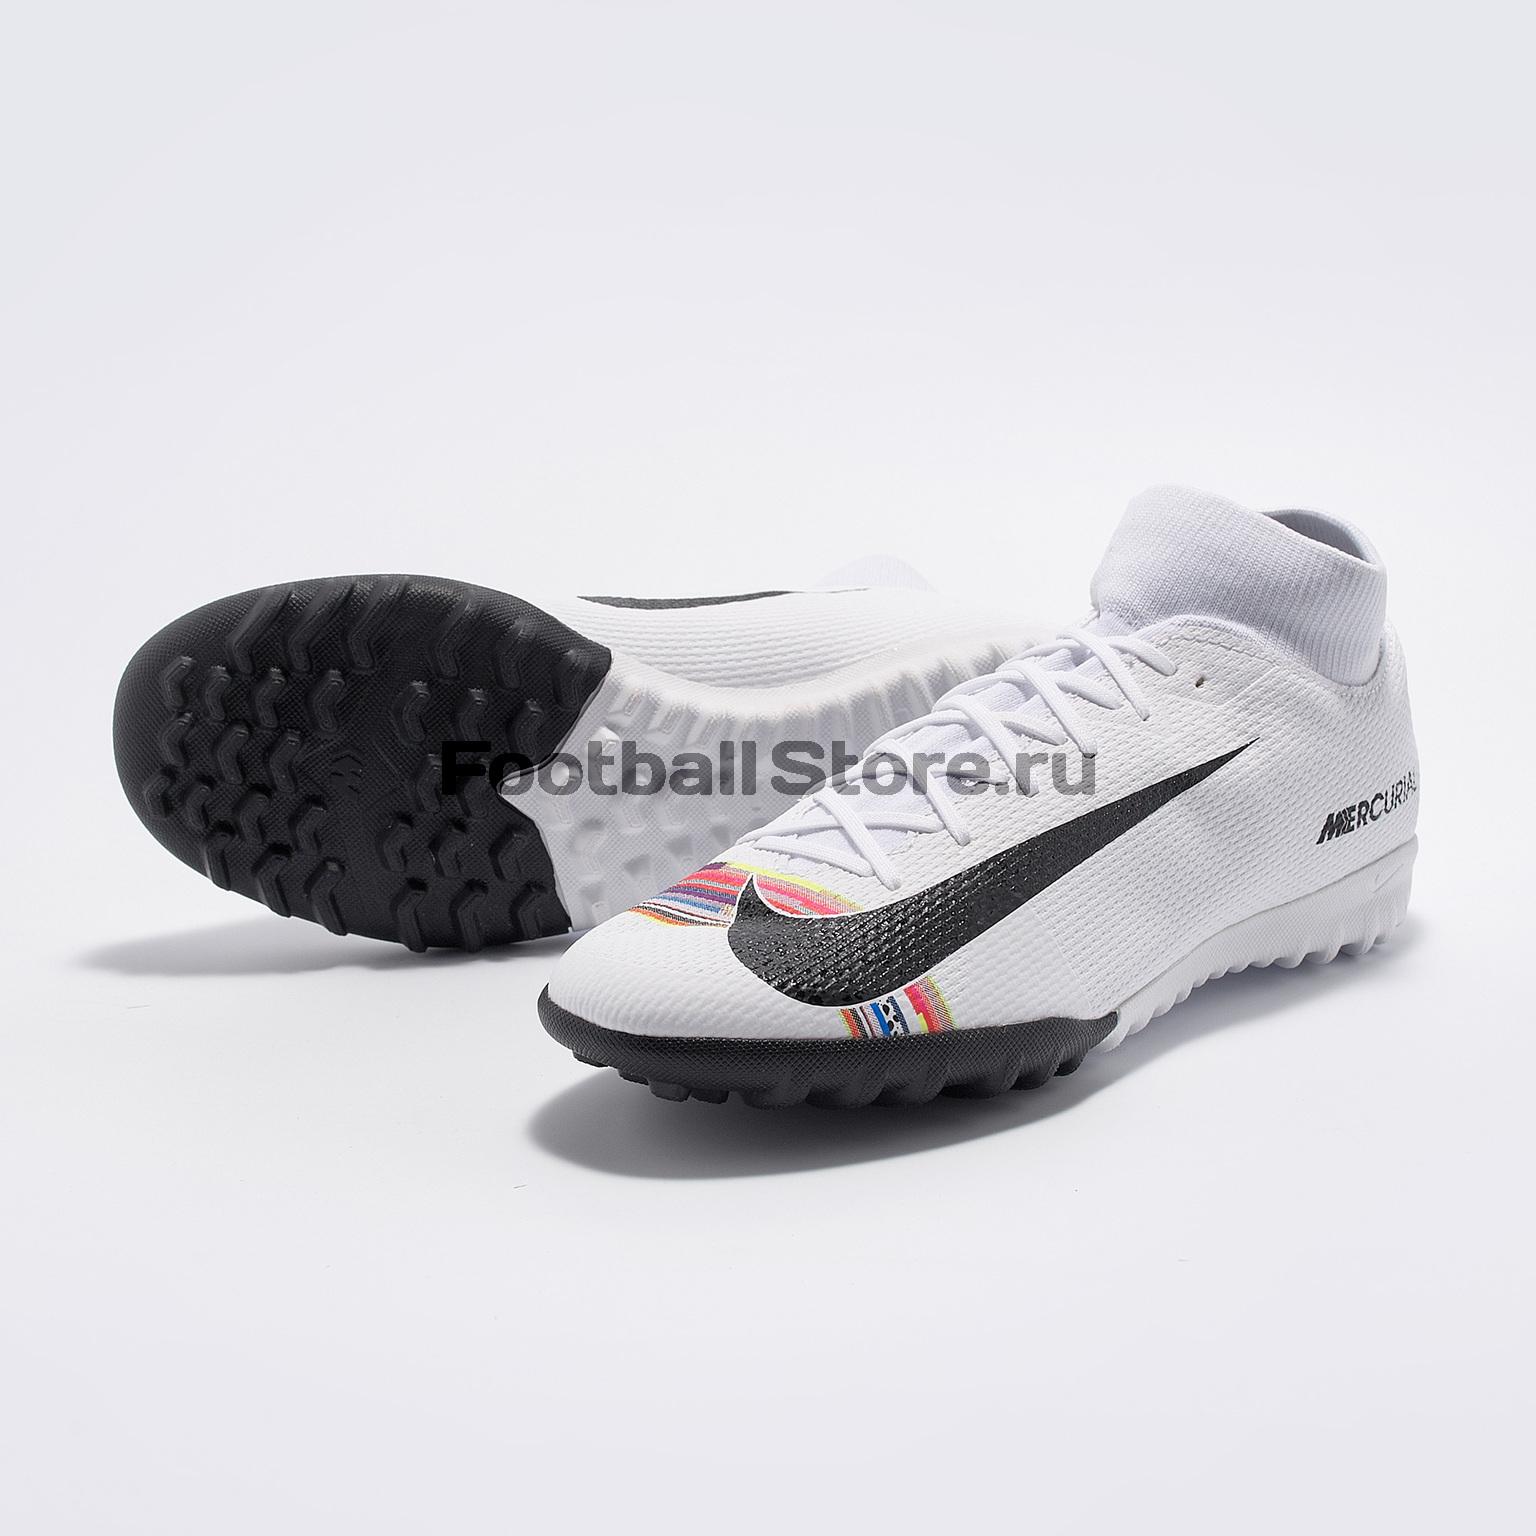 Шиповки Nike Superfly 6 Academy CR7 TF AJ3568-109